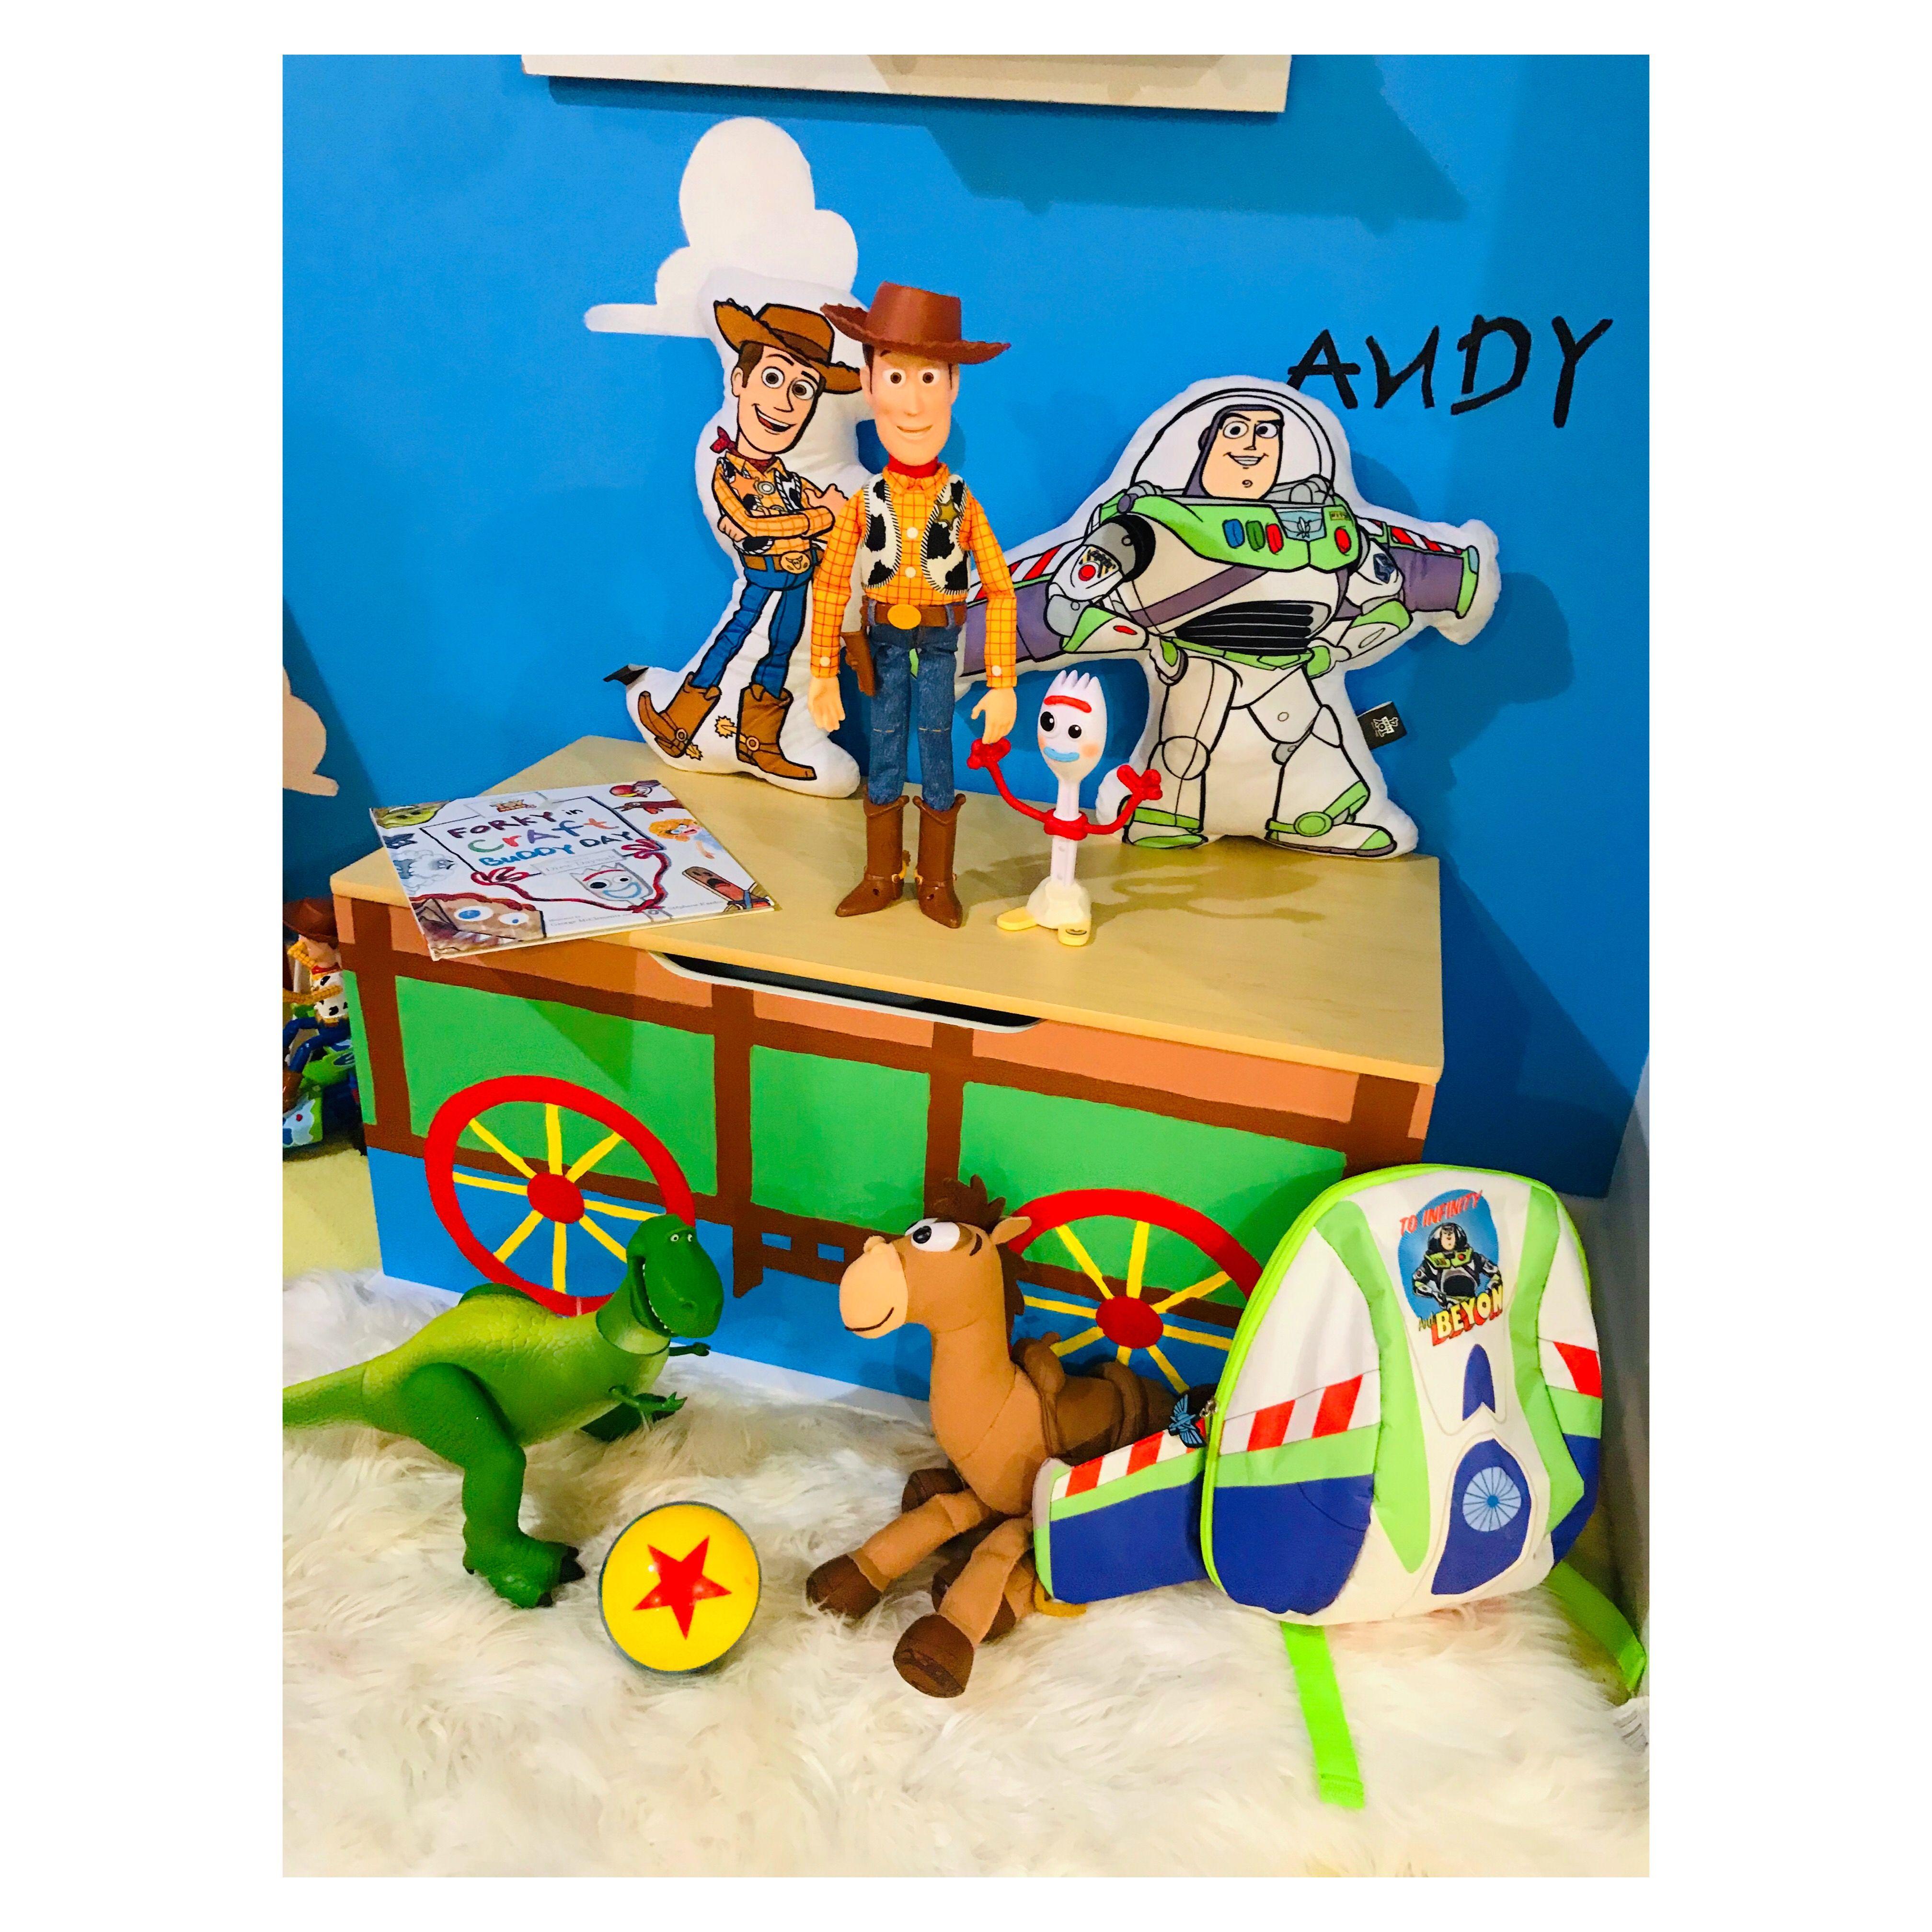 Diy By Me Kmart Toy Box Hack Toy Boxes Diy Toy Box Diy Box